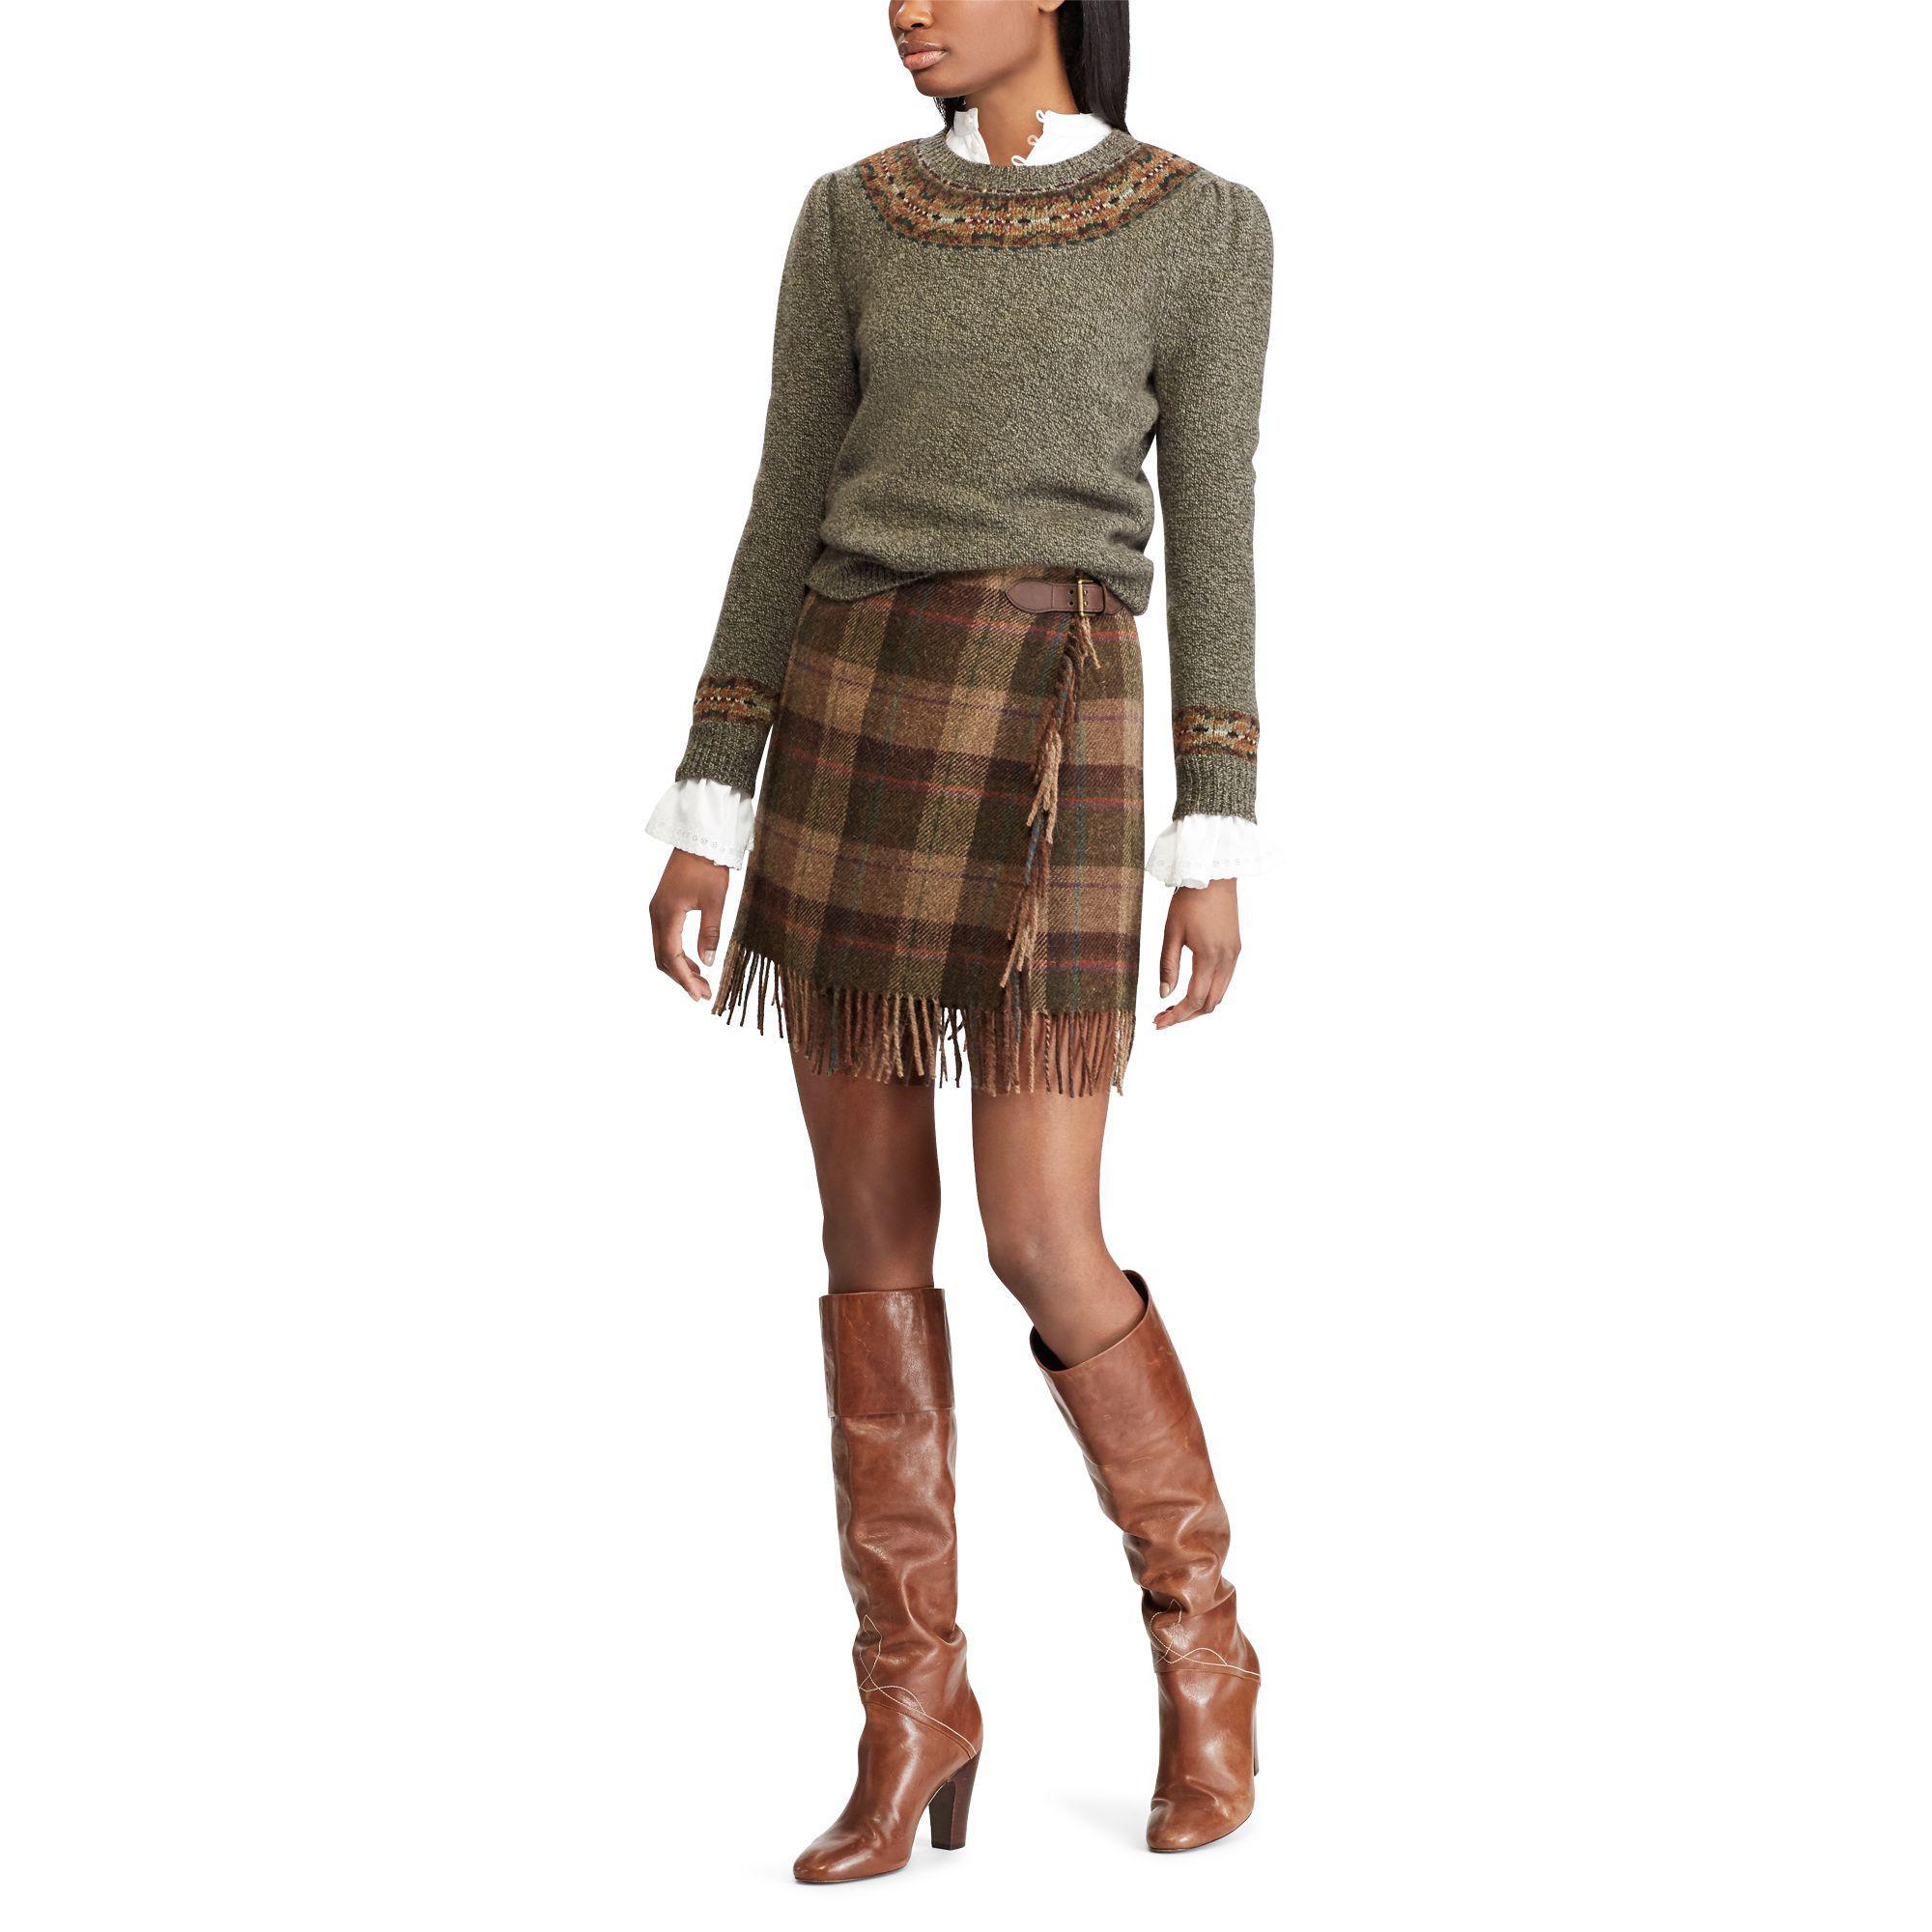 Polo Ralph Lauren Full Wrap Skirt Tie Side Bow Blue Green Tartan Plaid